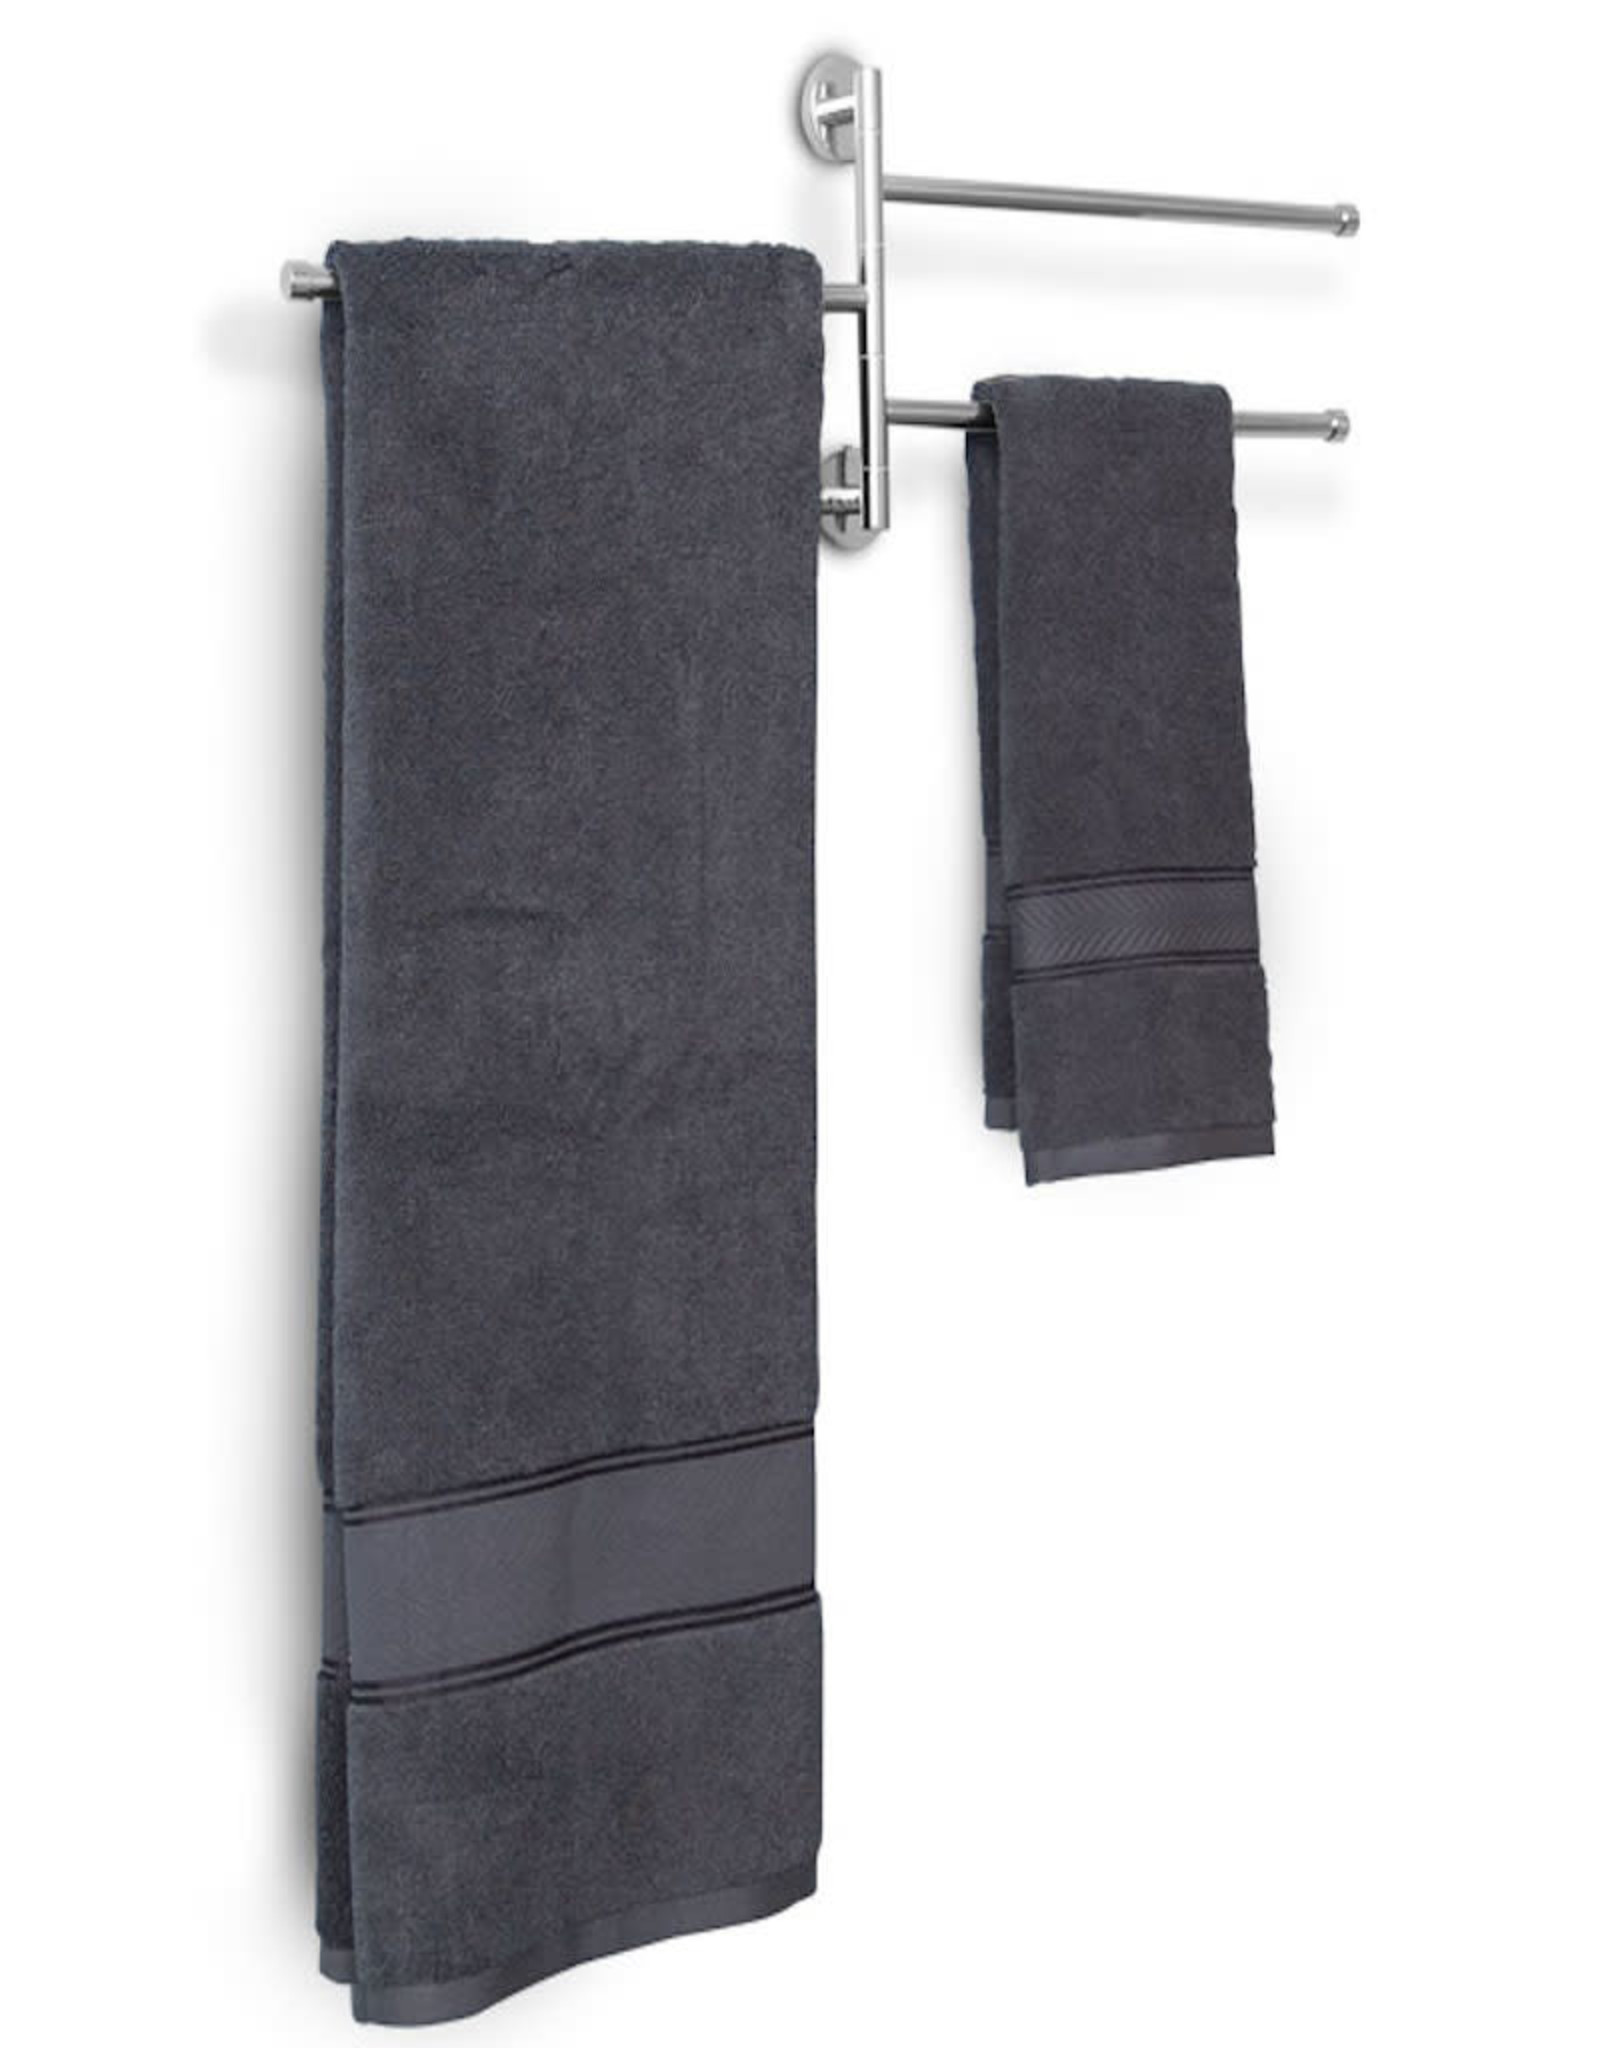 LalOO Laloo Triple Swing Towel Bar